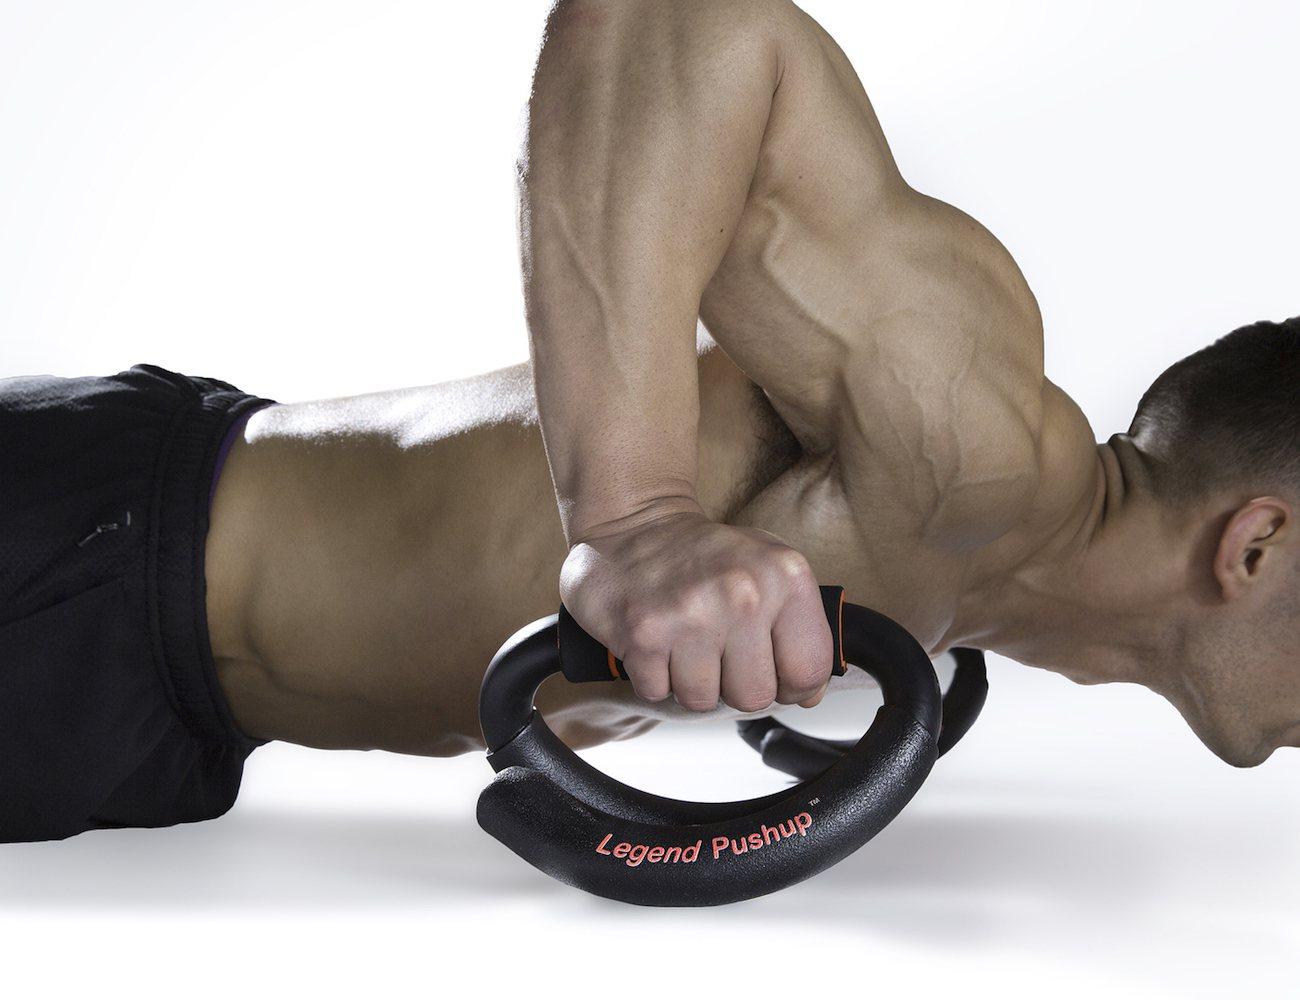 legend-pushup-04